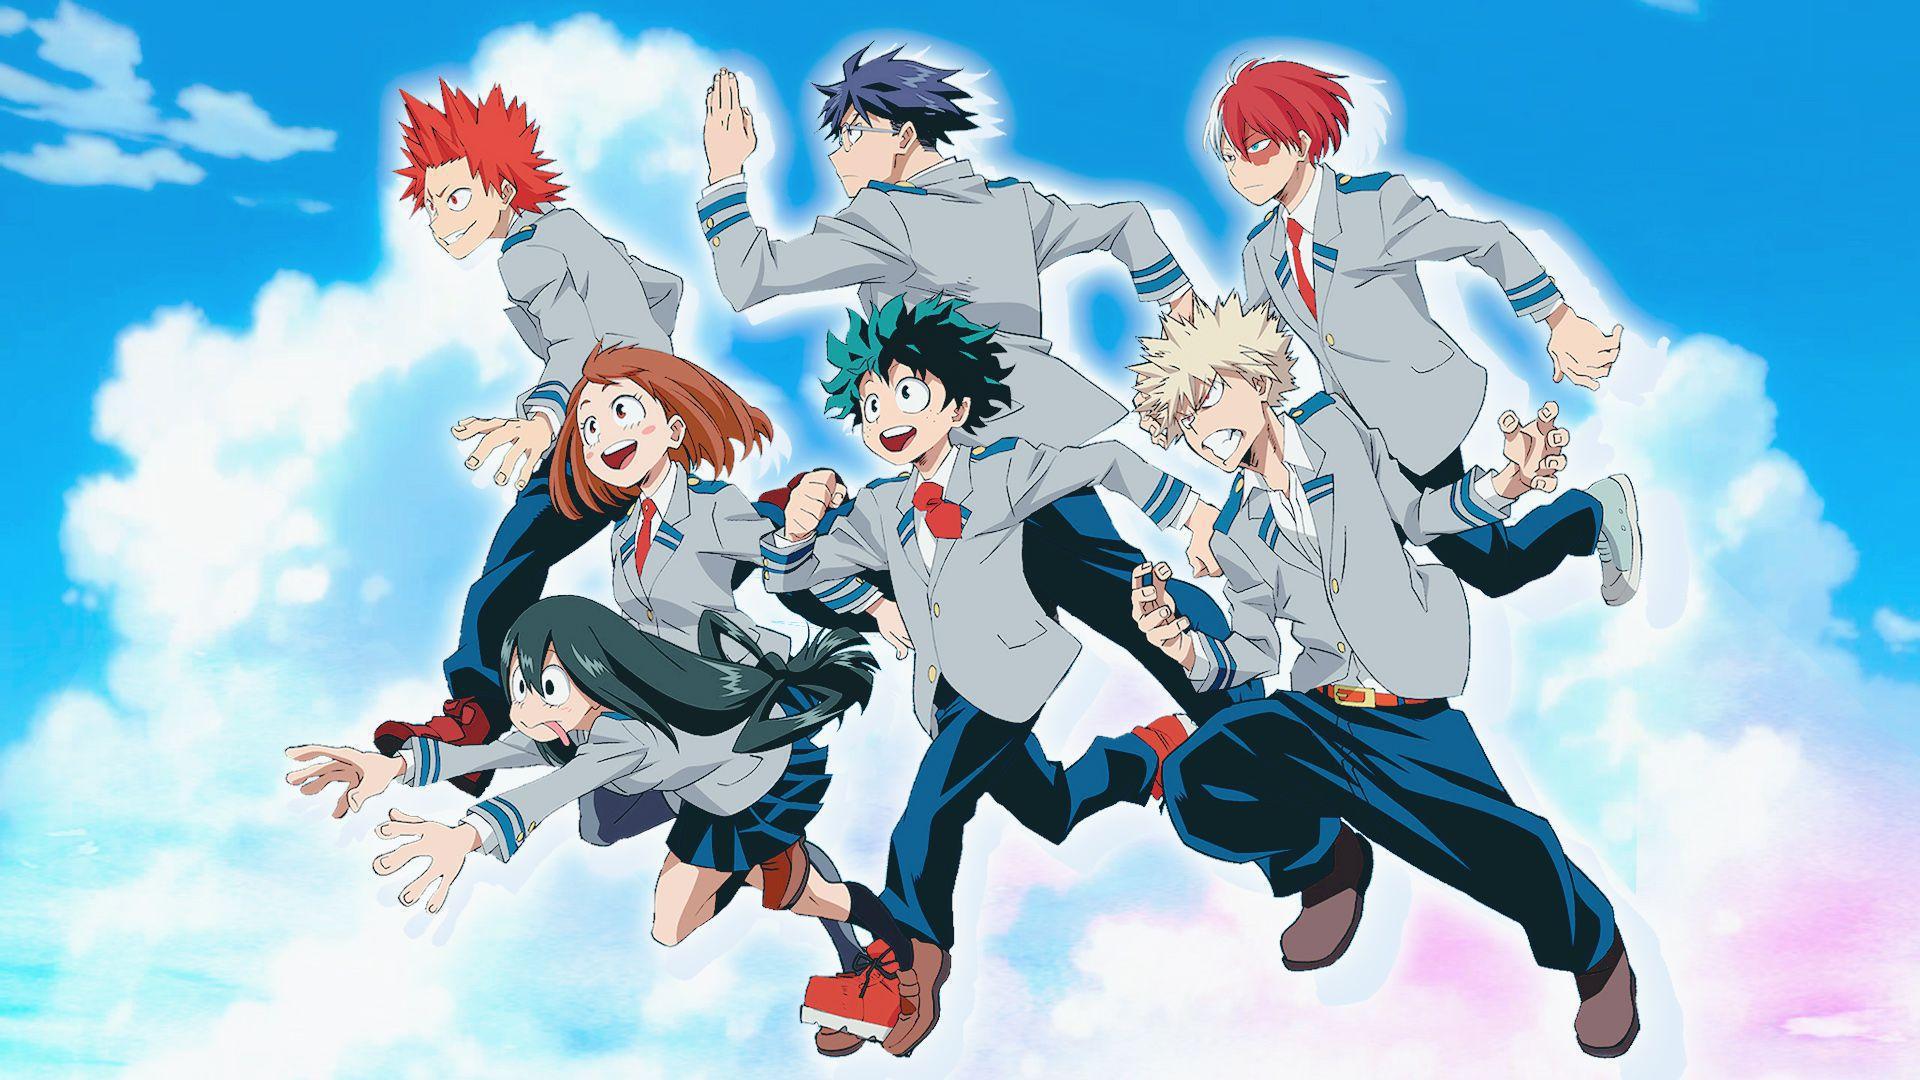 Boku no hero academia kaminari denki male tagme wallpaper | #458689 | yande.re. Aesthetic Anime Wallpapers Chromebook - Anime Wallpaper HD